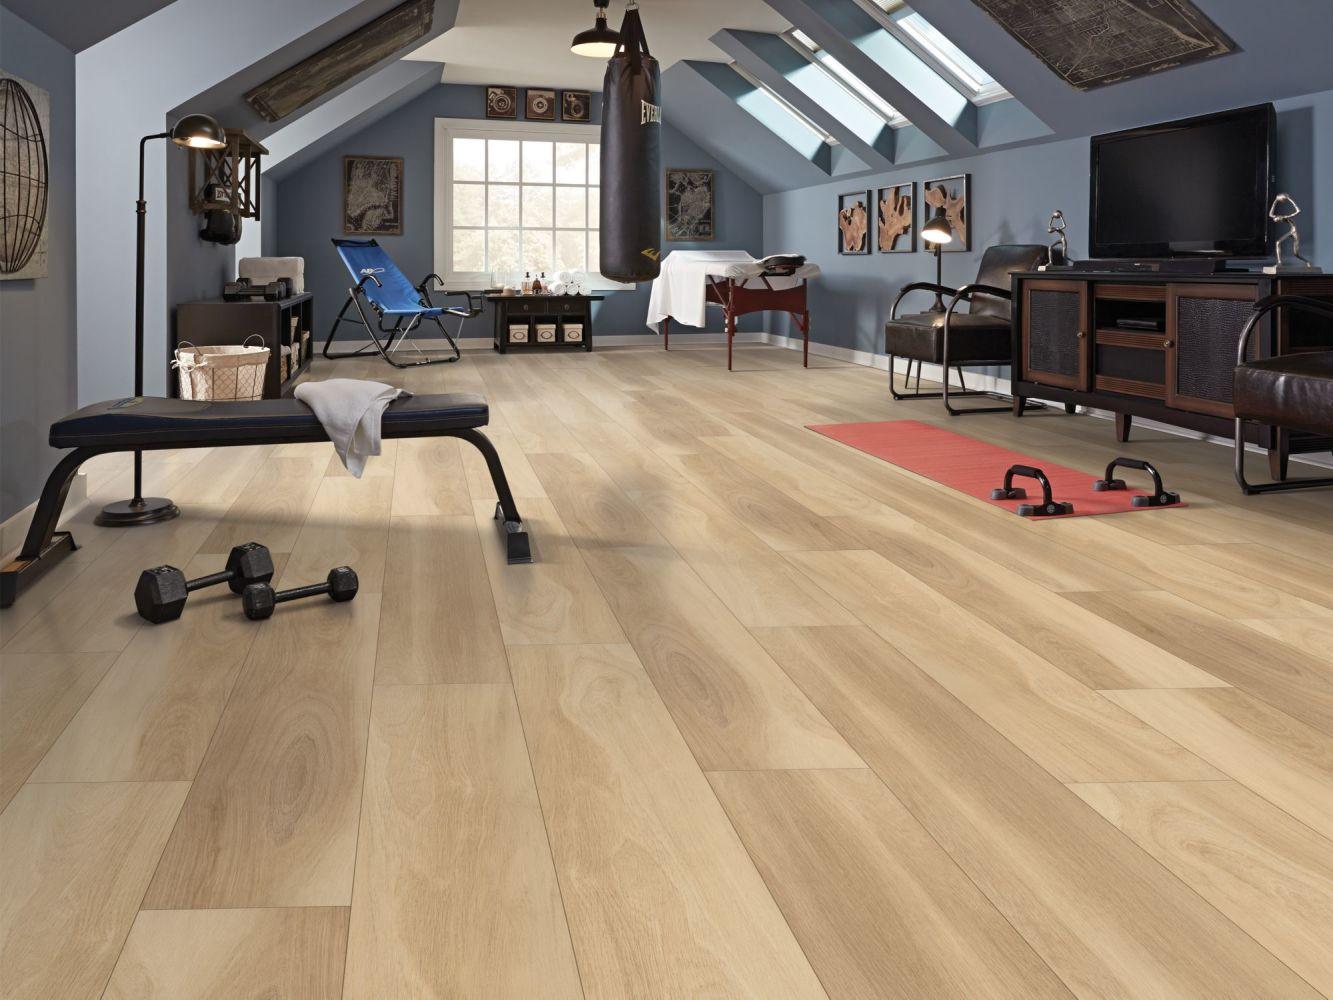 Shaw Floors Resilient Property Solutions Barrel Oak 720c Plus Natural Oak 02000_515RG